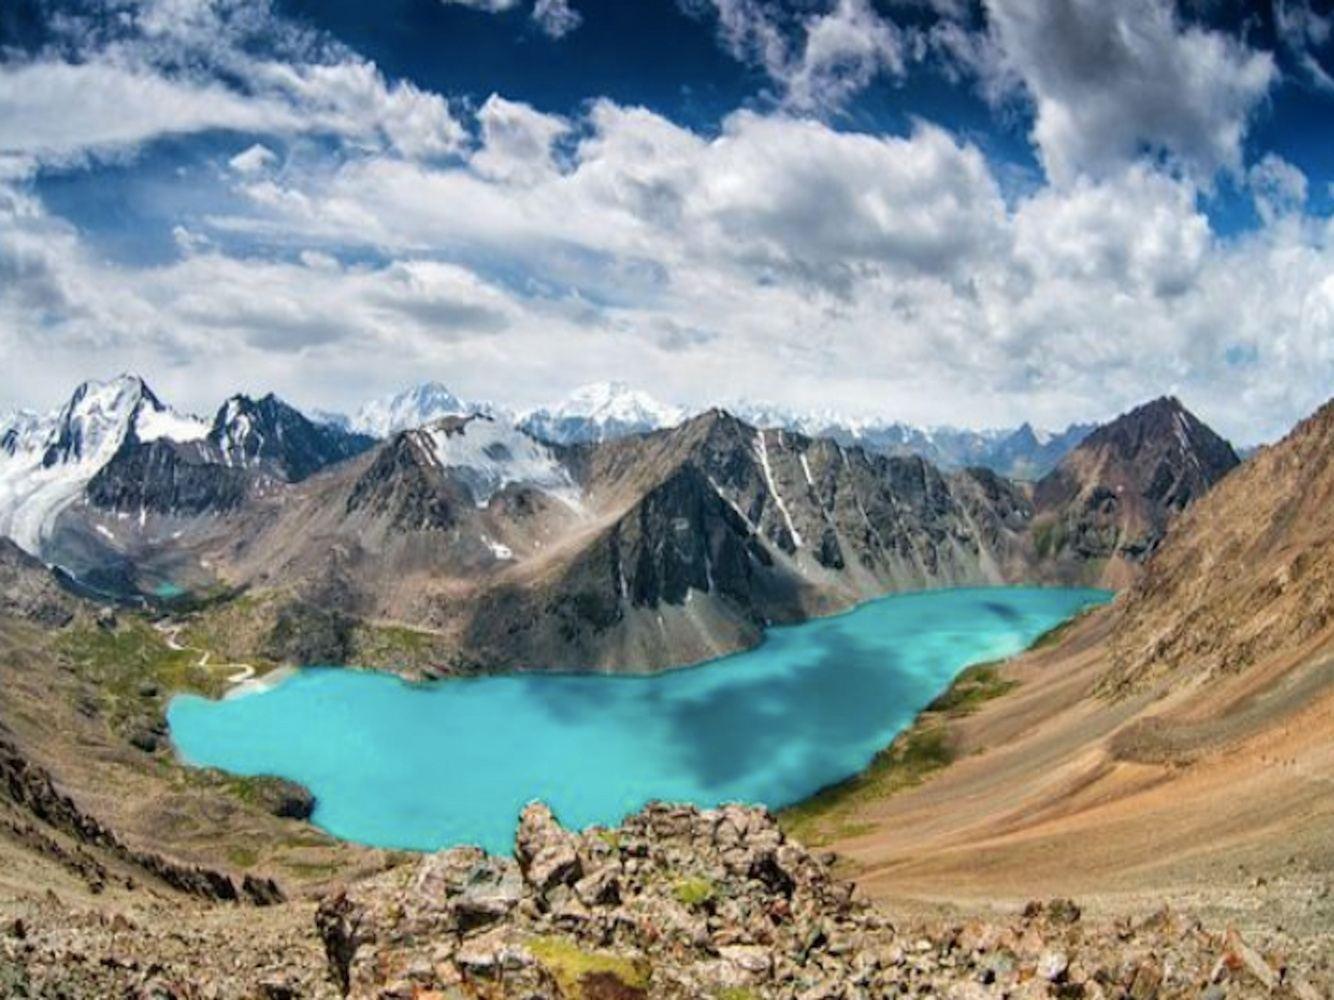 (Full) Kyrgyzstan - Natural Beauty & Nomadic Traditions